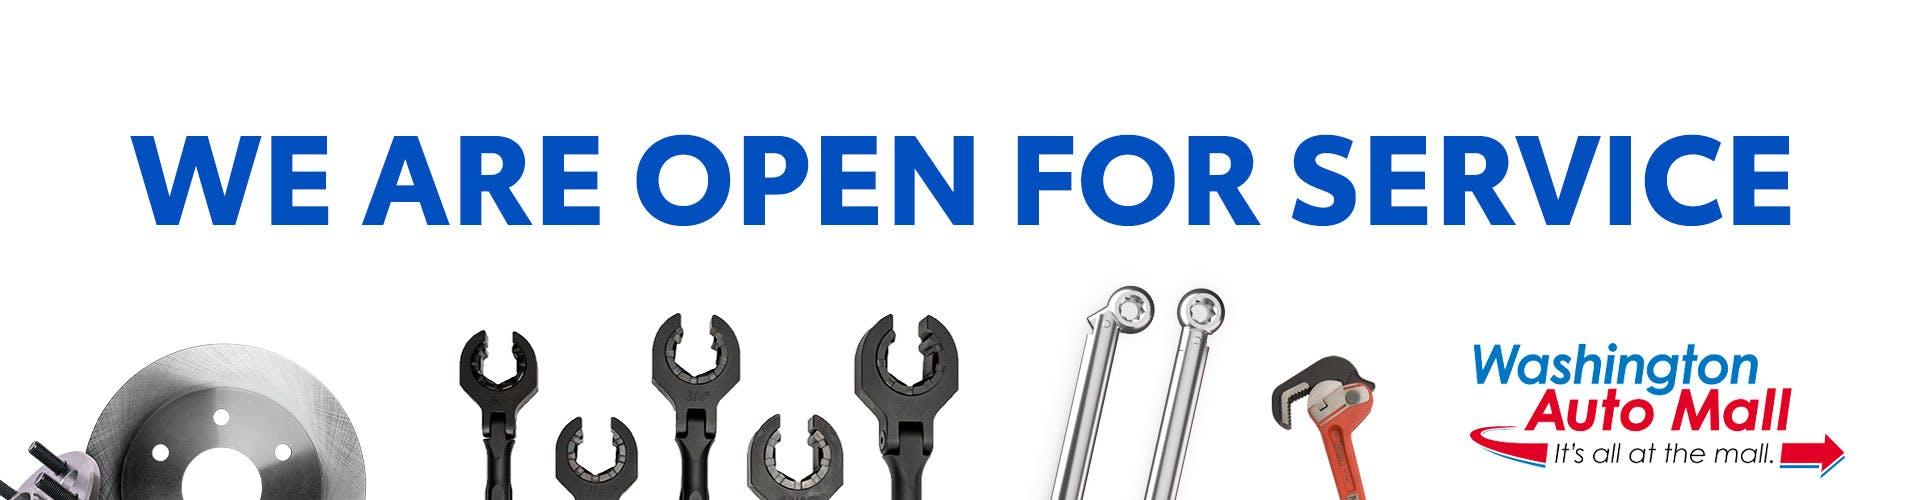 open for service: washington auto mall